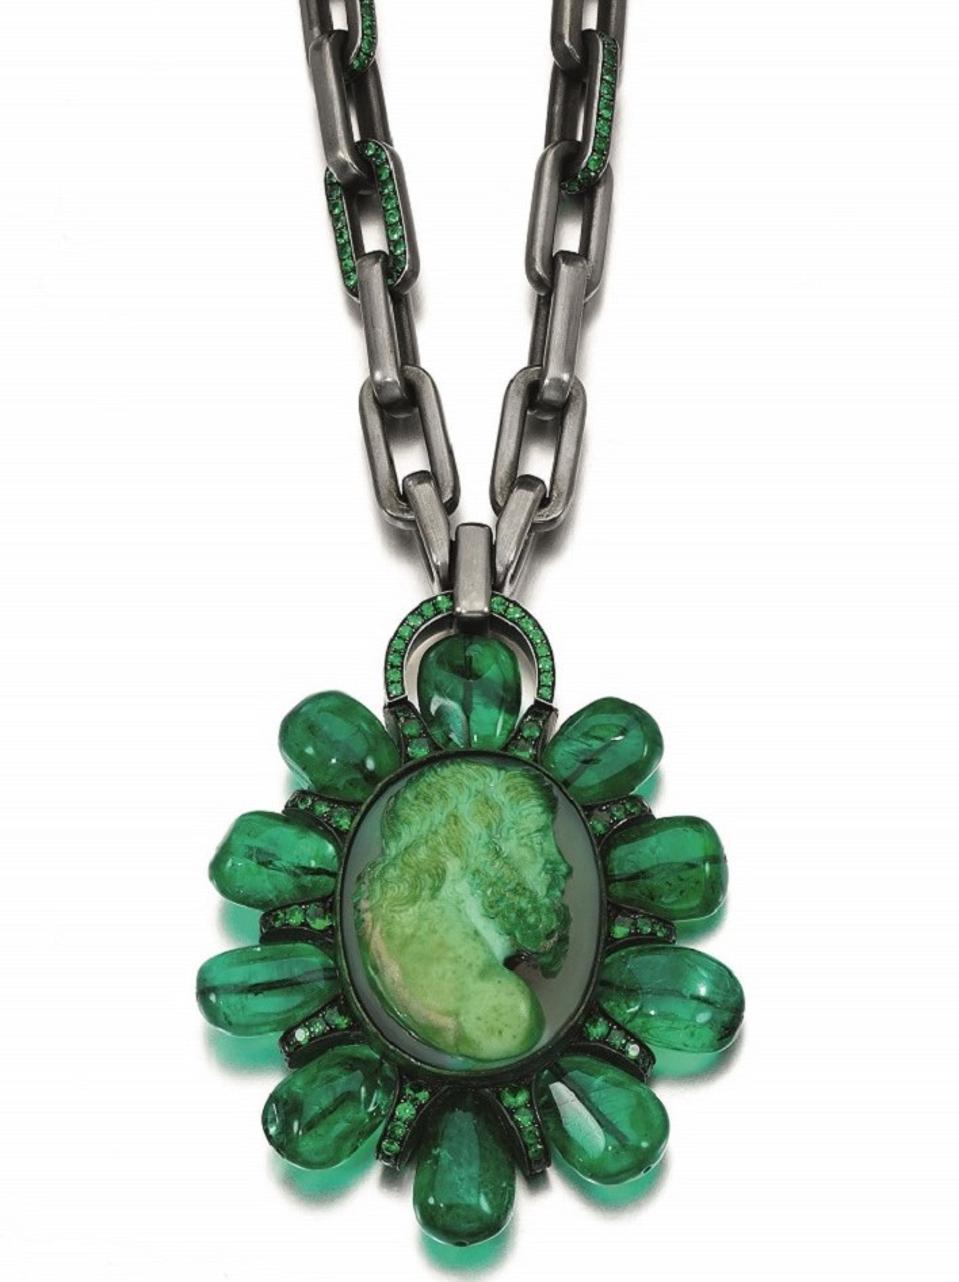 Emerald, hardstone cameo and tsavorite garnet pendant necklace by Hemmerle